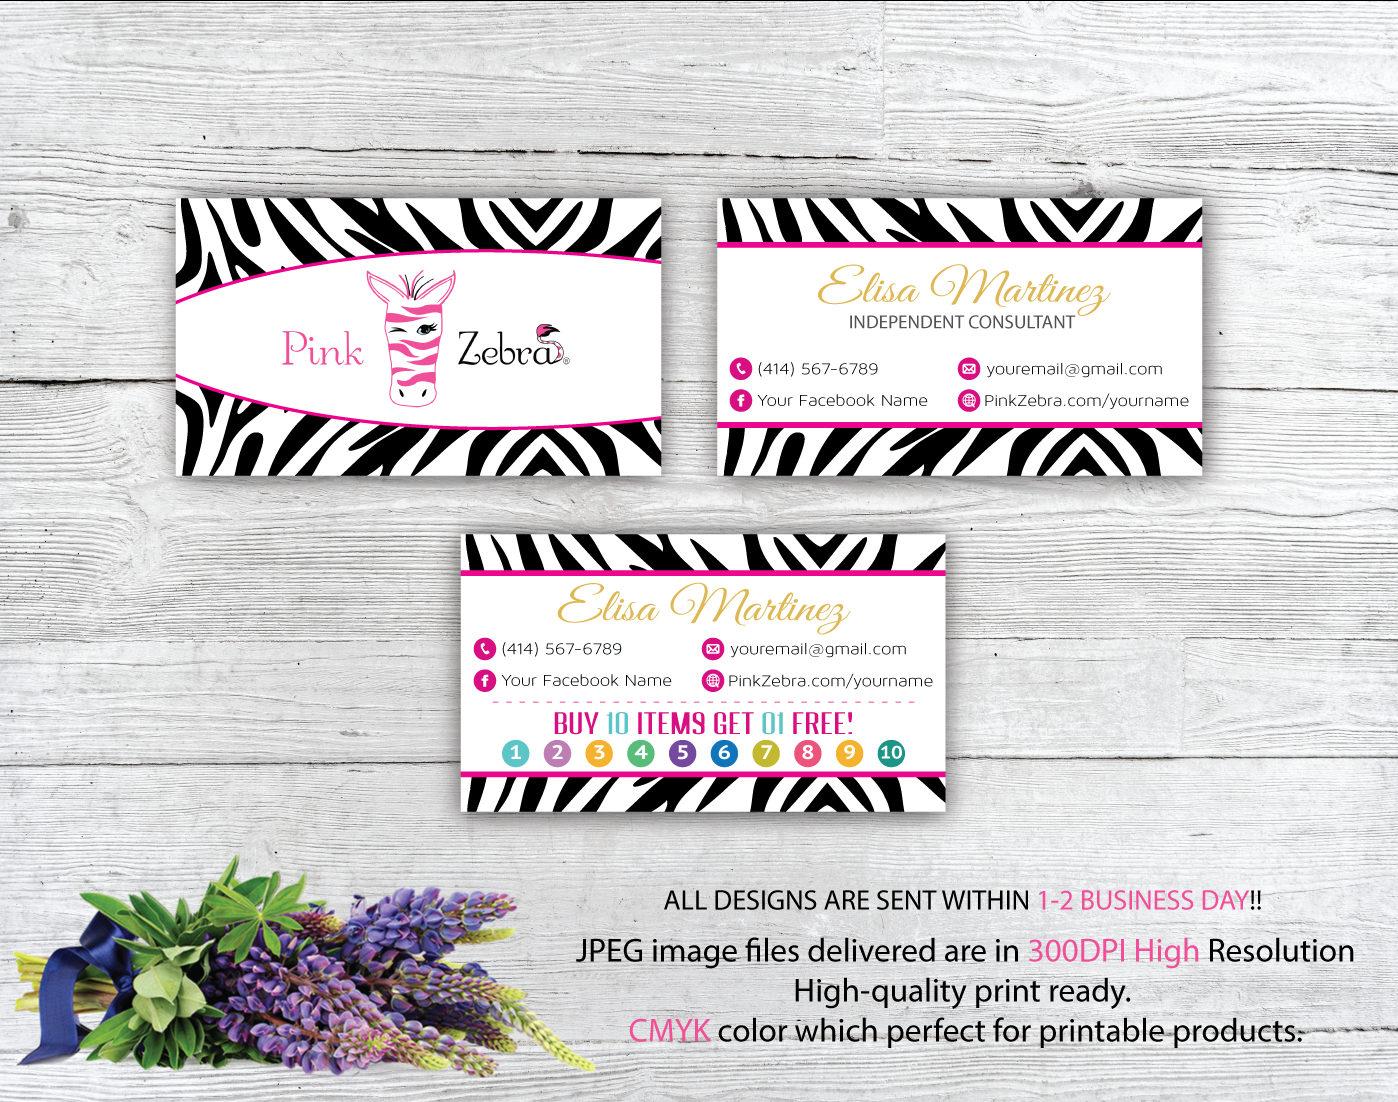 Pink Zebra Business Cards Pink Zebra Buy 10 get 1 free